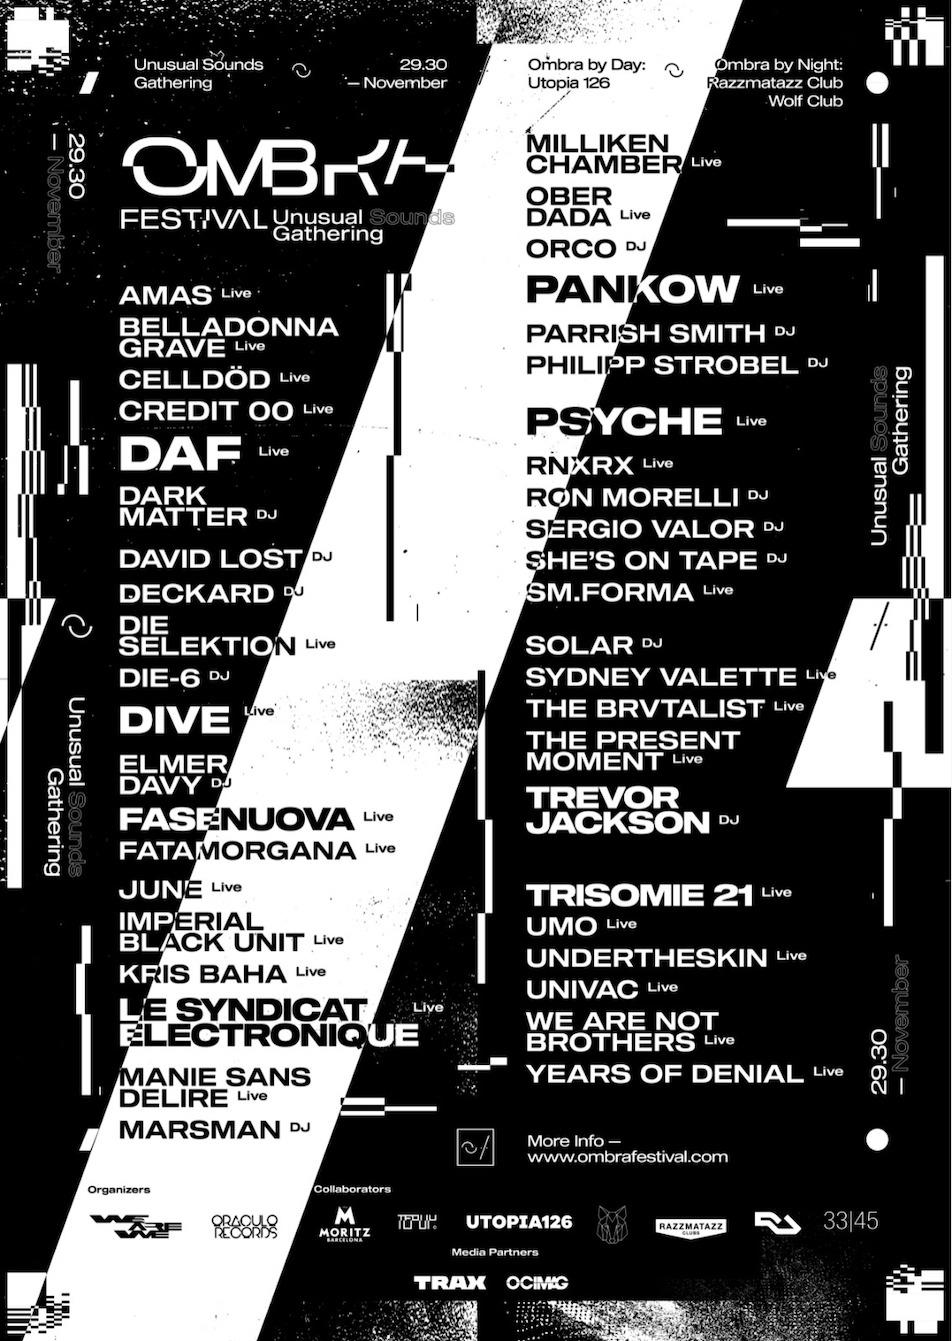 Barcelona's Ombra Festival finalises 2019 lineup with DAF, Trevor Jackson